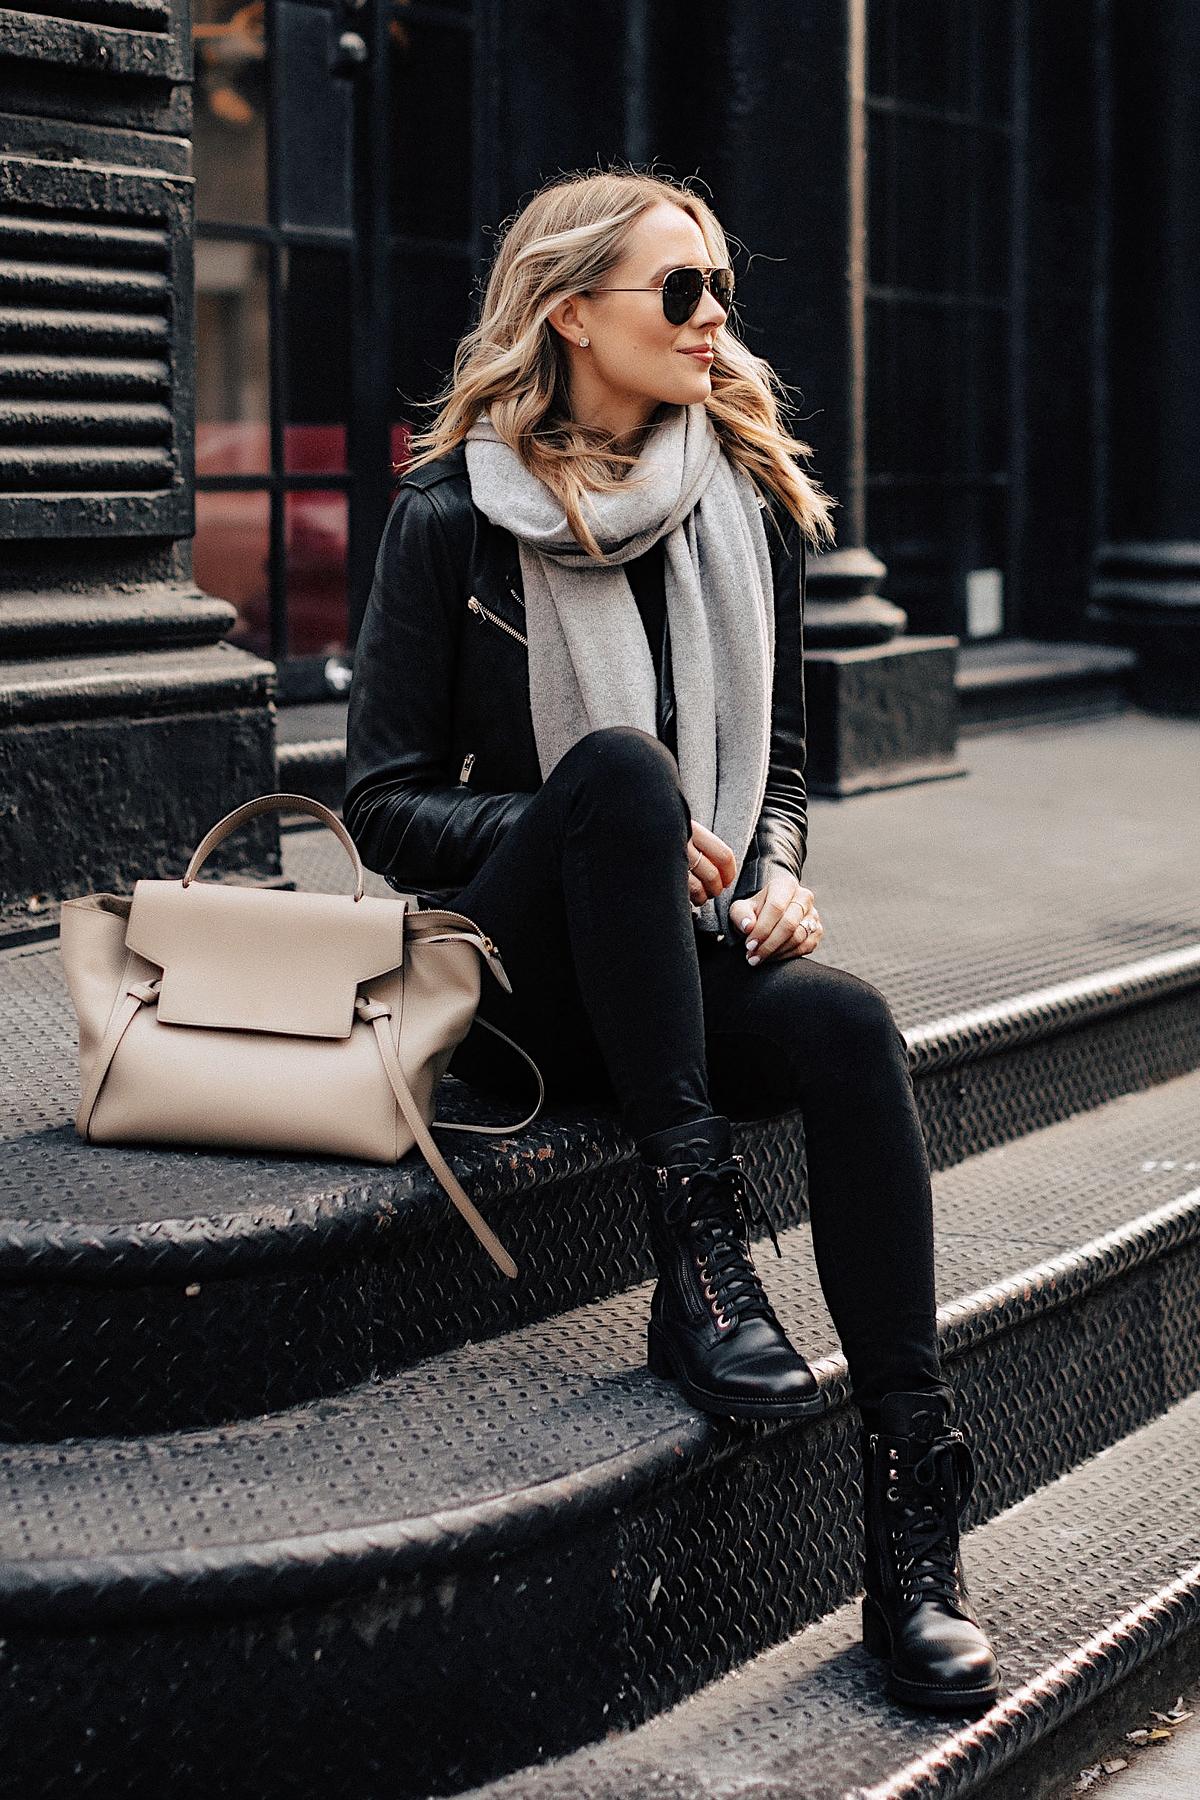 Fashion Jackson Wearing Black Leather Jacket Black Skinny Jeans Chanel Combat Boots Grey Scarf Celine Mini Belt Bag New York City Street Style